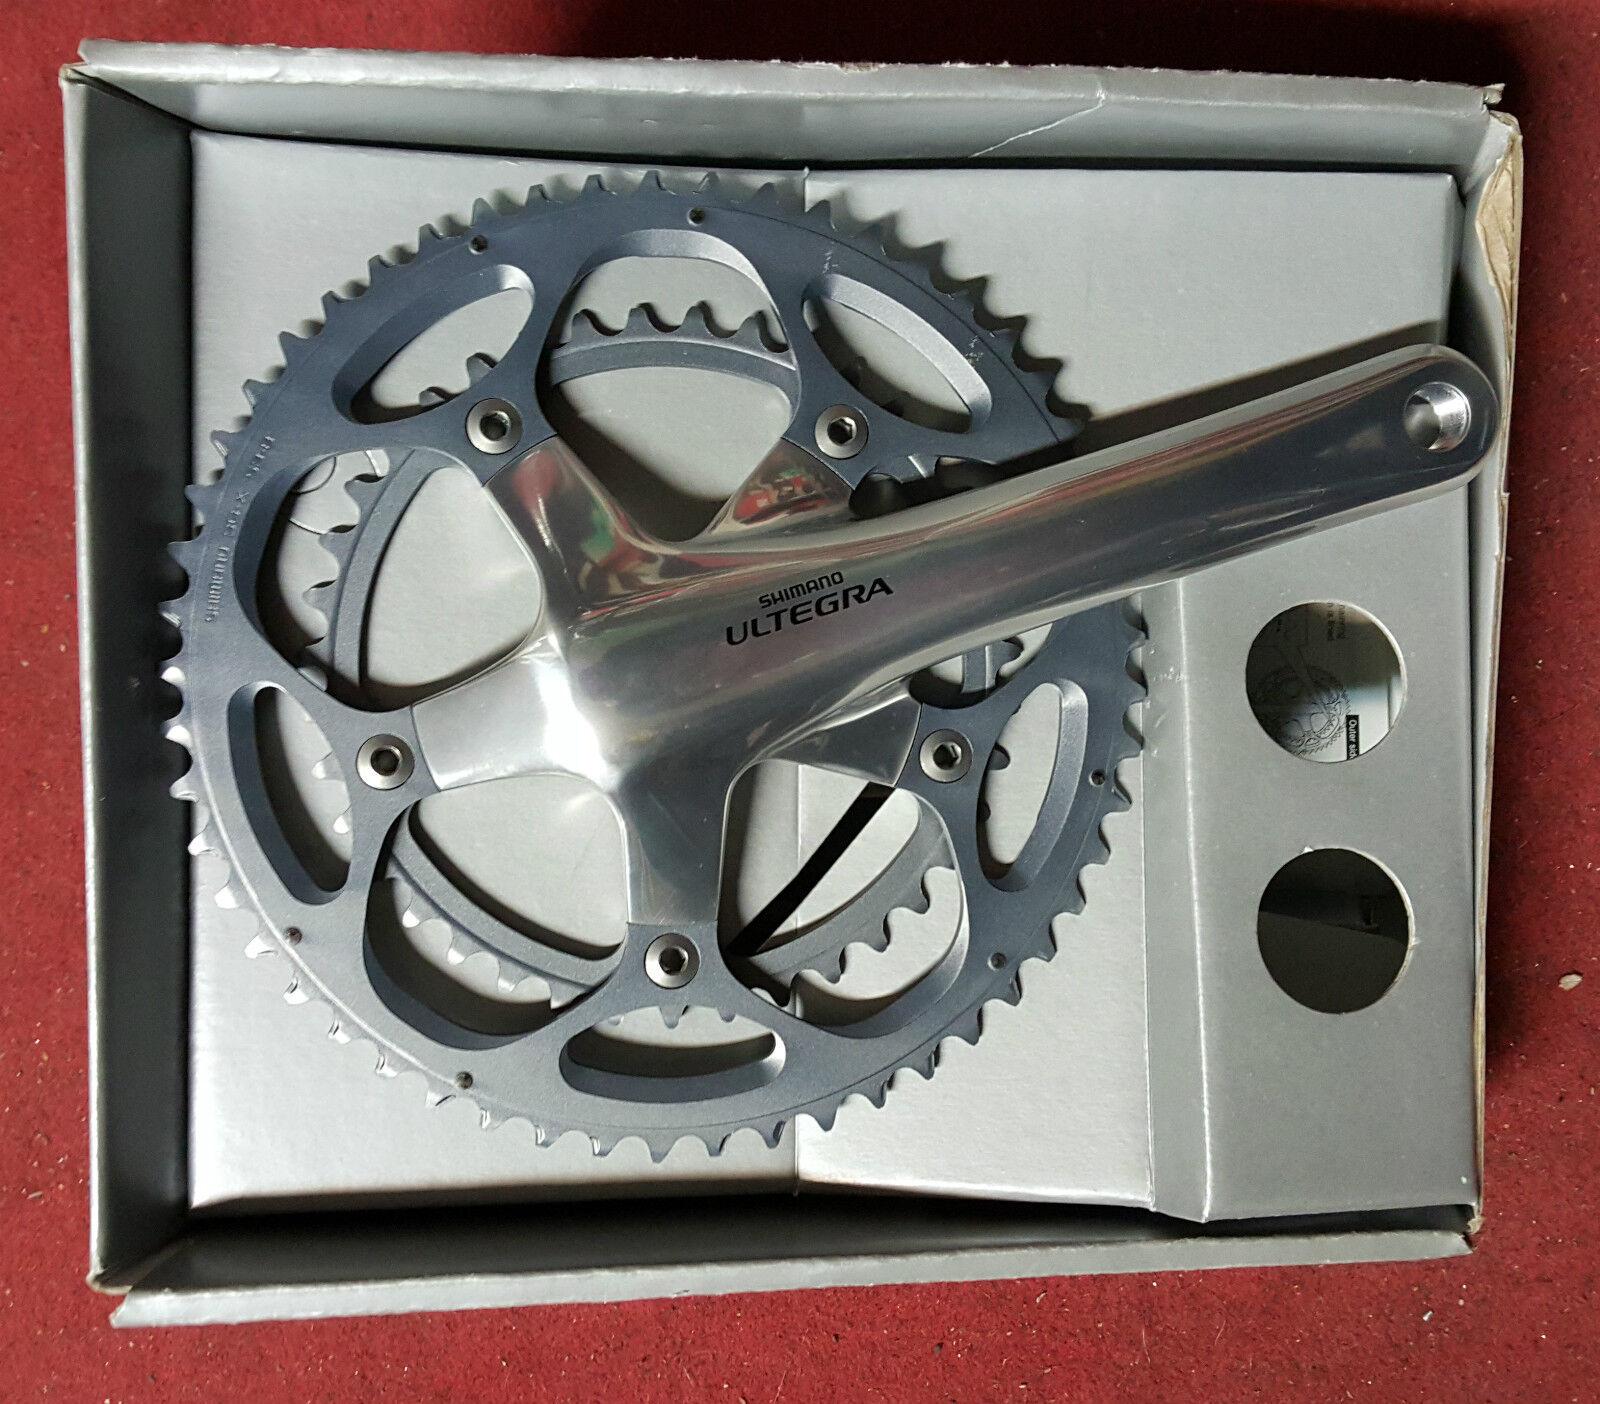 Guarnitura bici Shimano Ultegra FC-6600 53-39 t 172.5 170 10 bike crankset speed